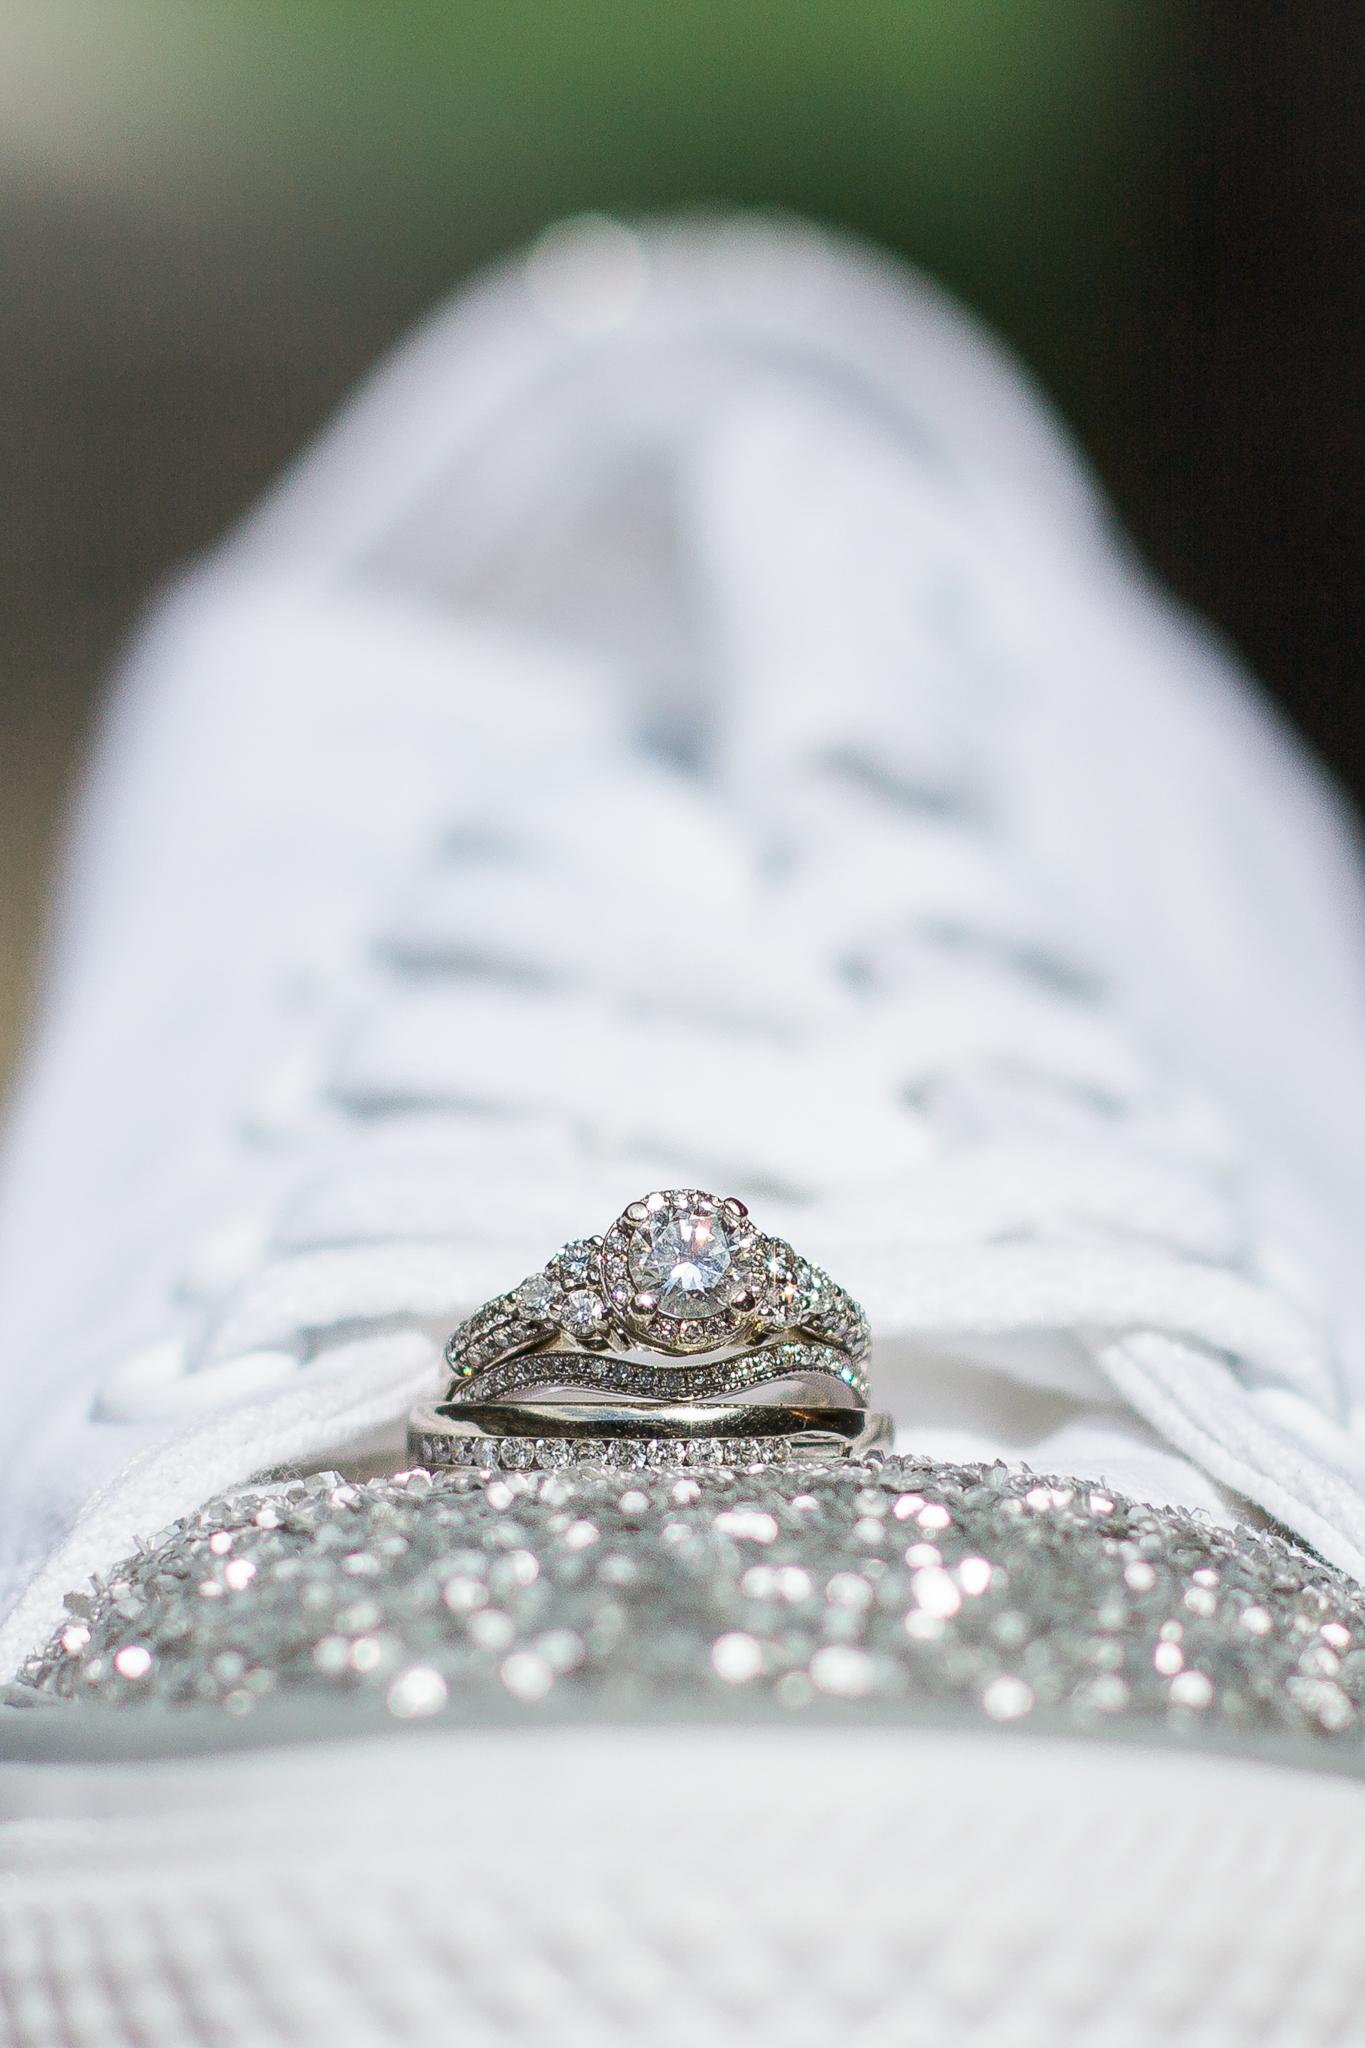 Richmond Kentucky Wedding Photographer - Ariana Jordan Photography -20-2.jpg